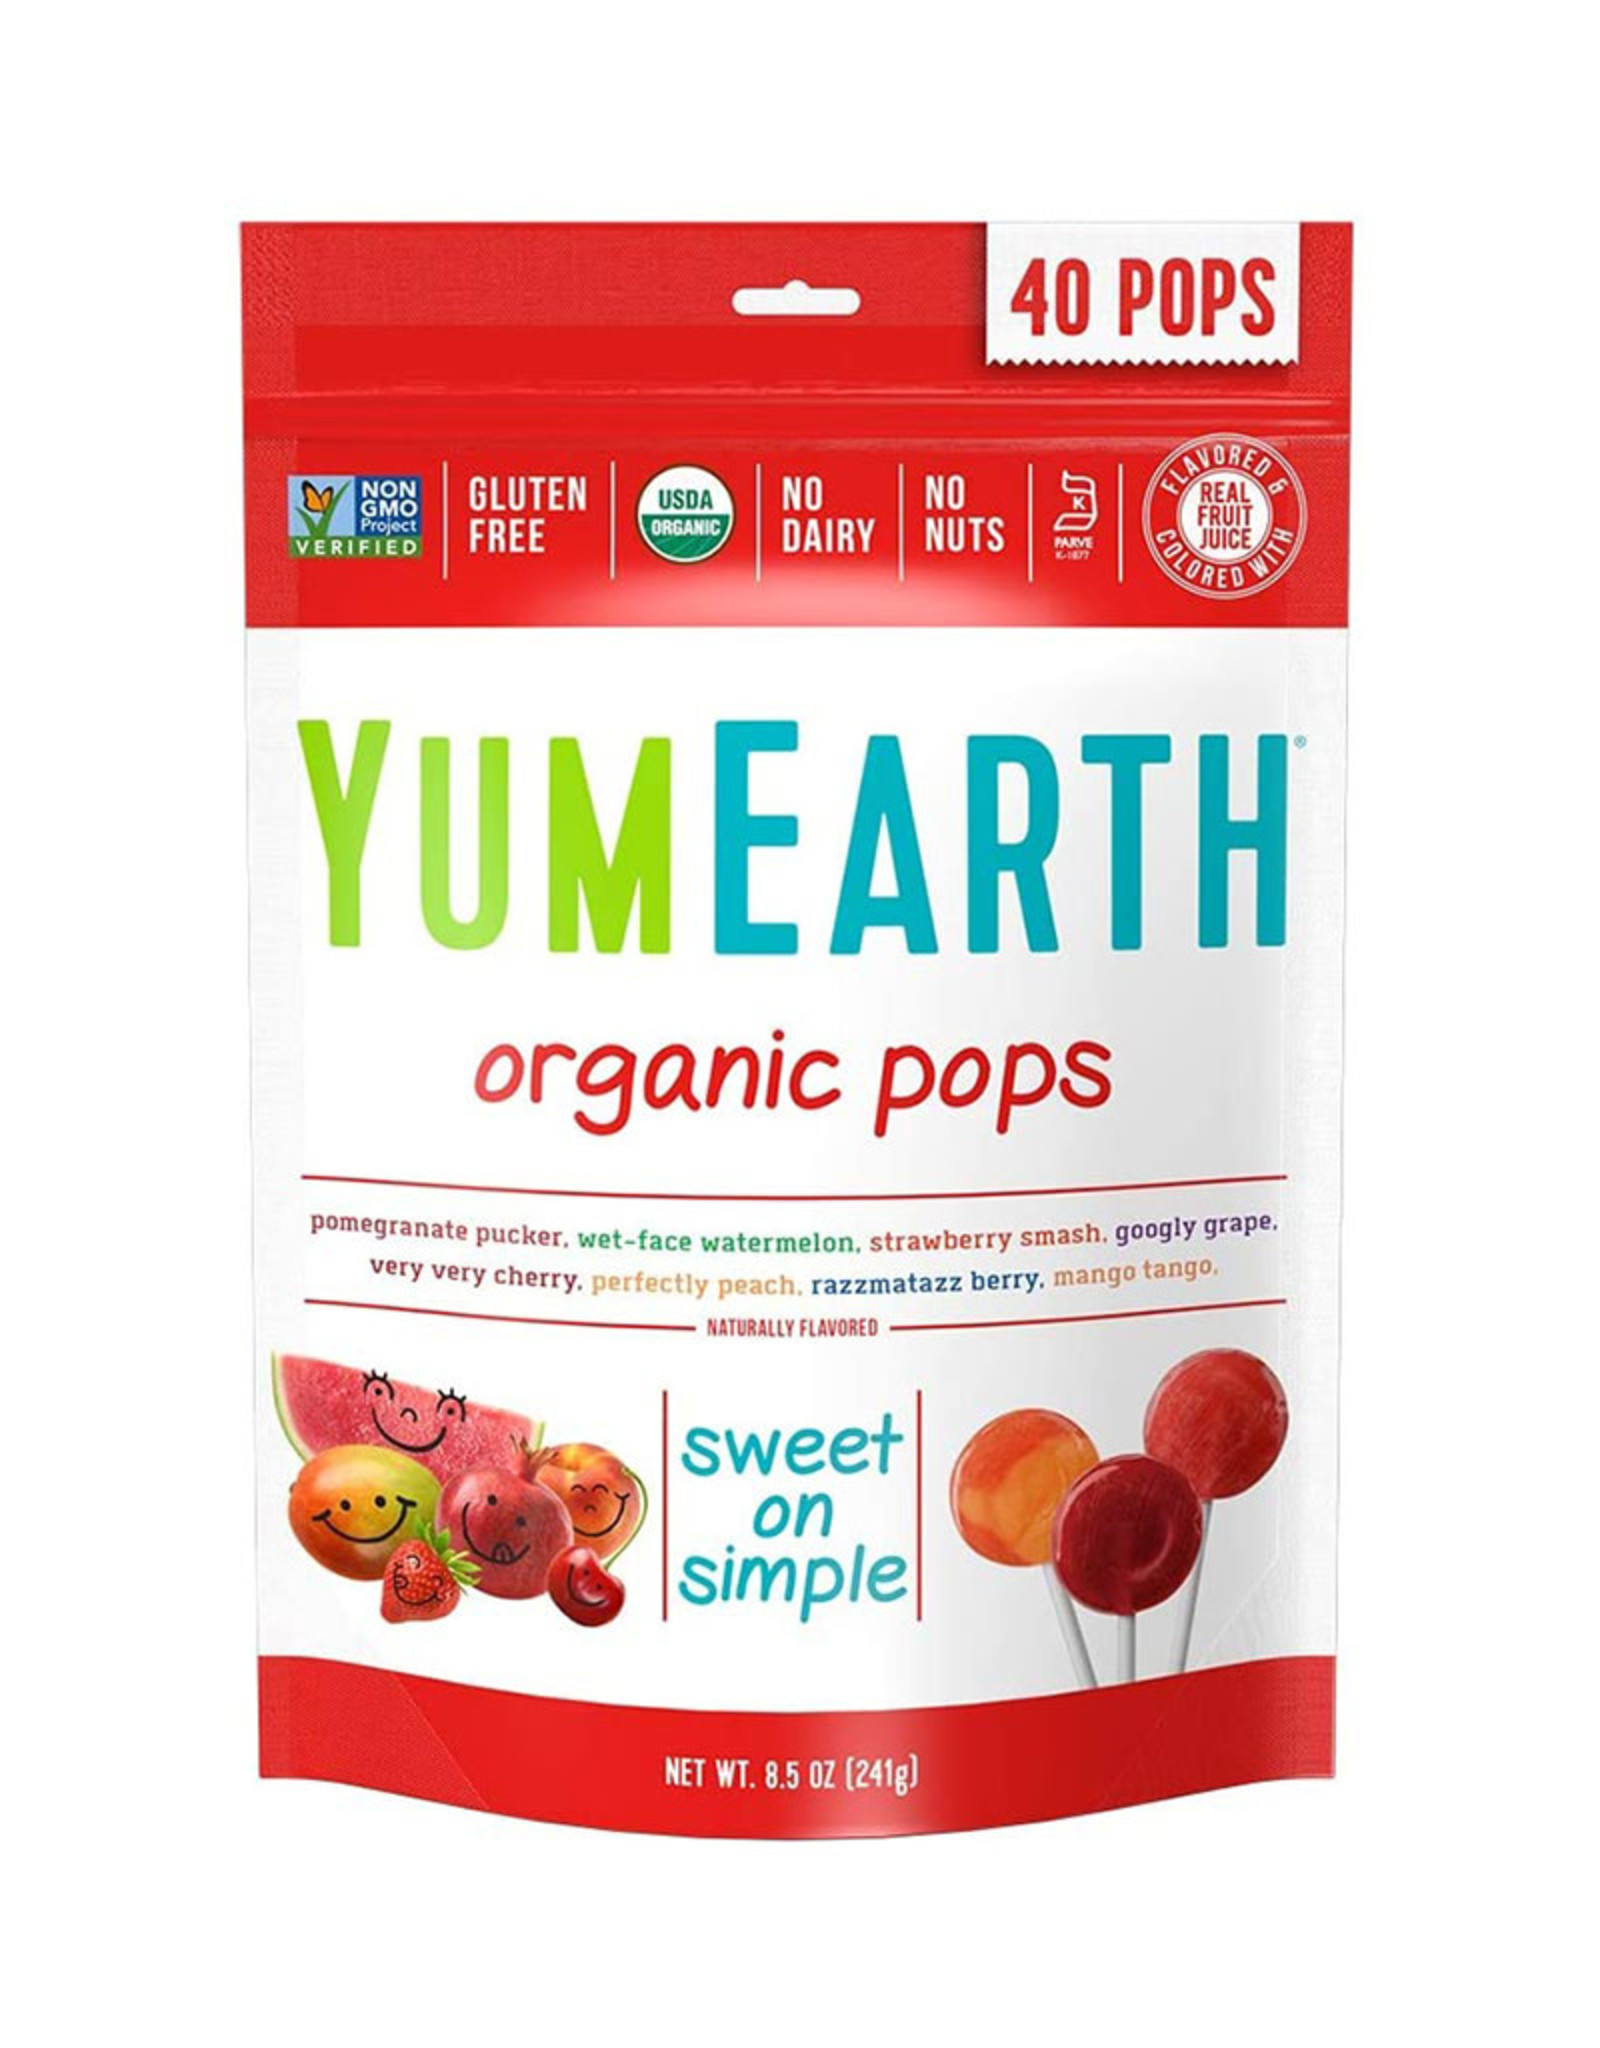 Yum Earth Yum Earth - Candy, Organic Fruit Pops (Bag)